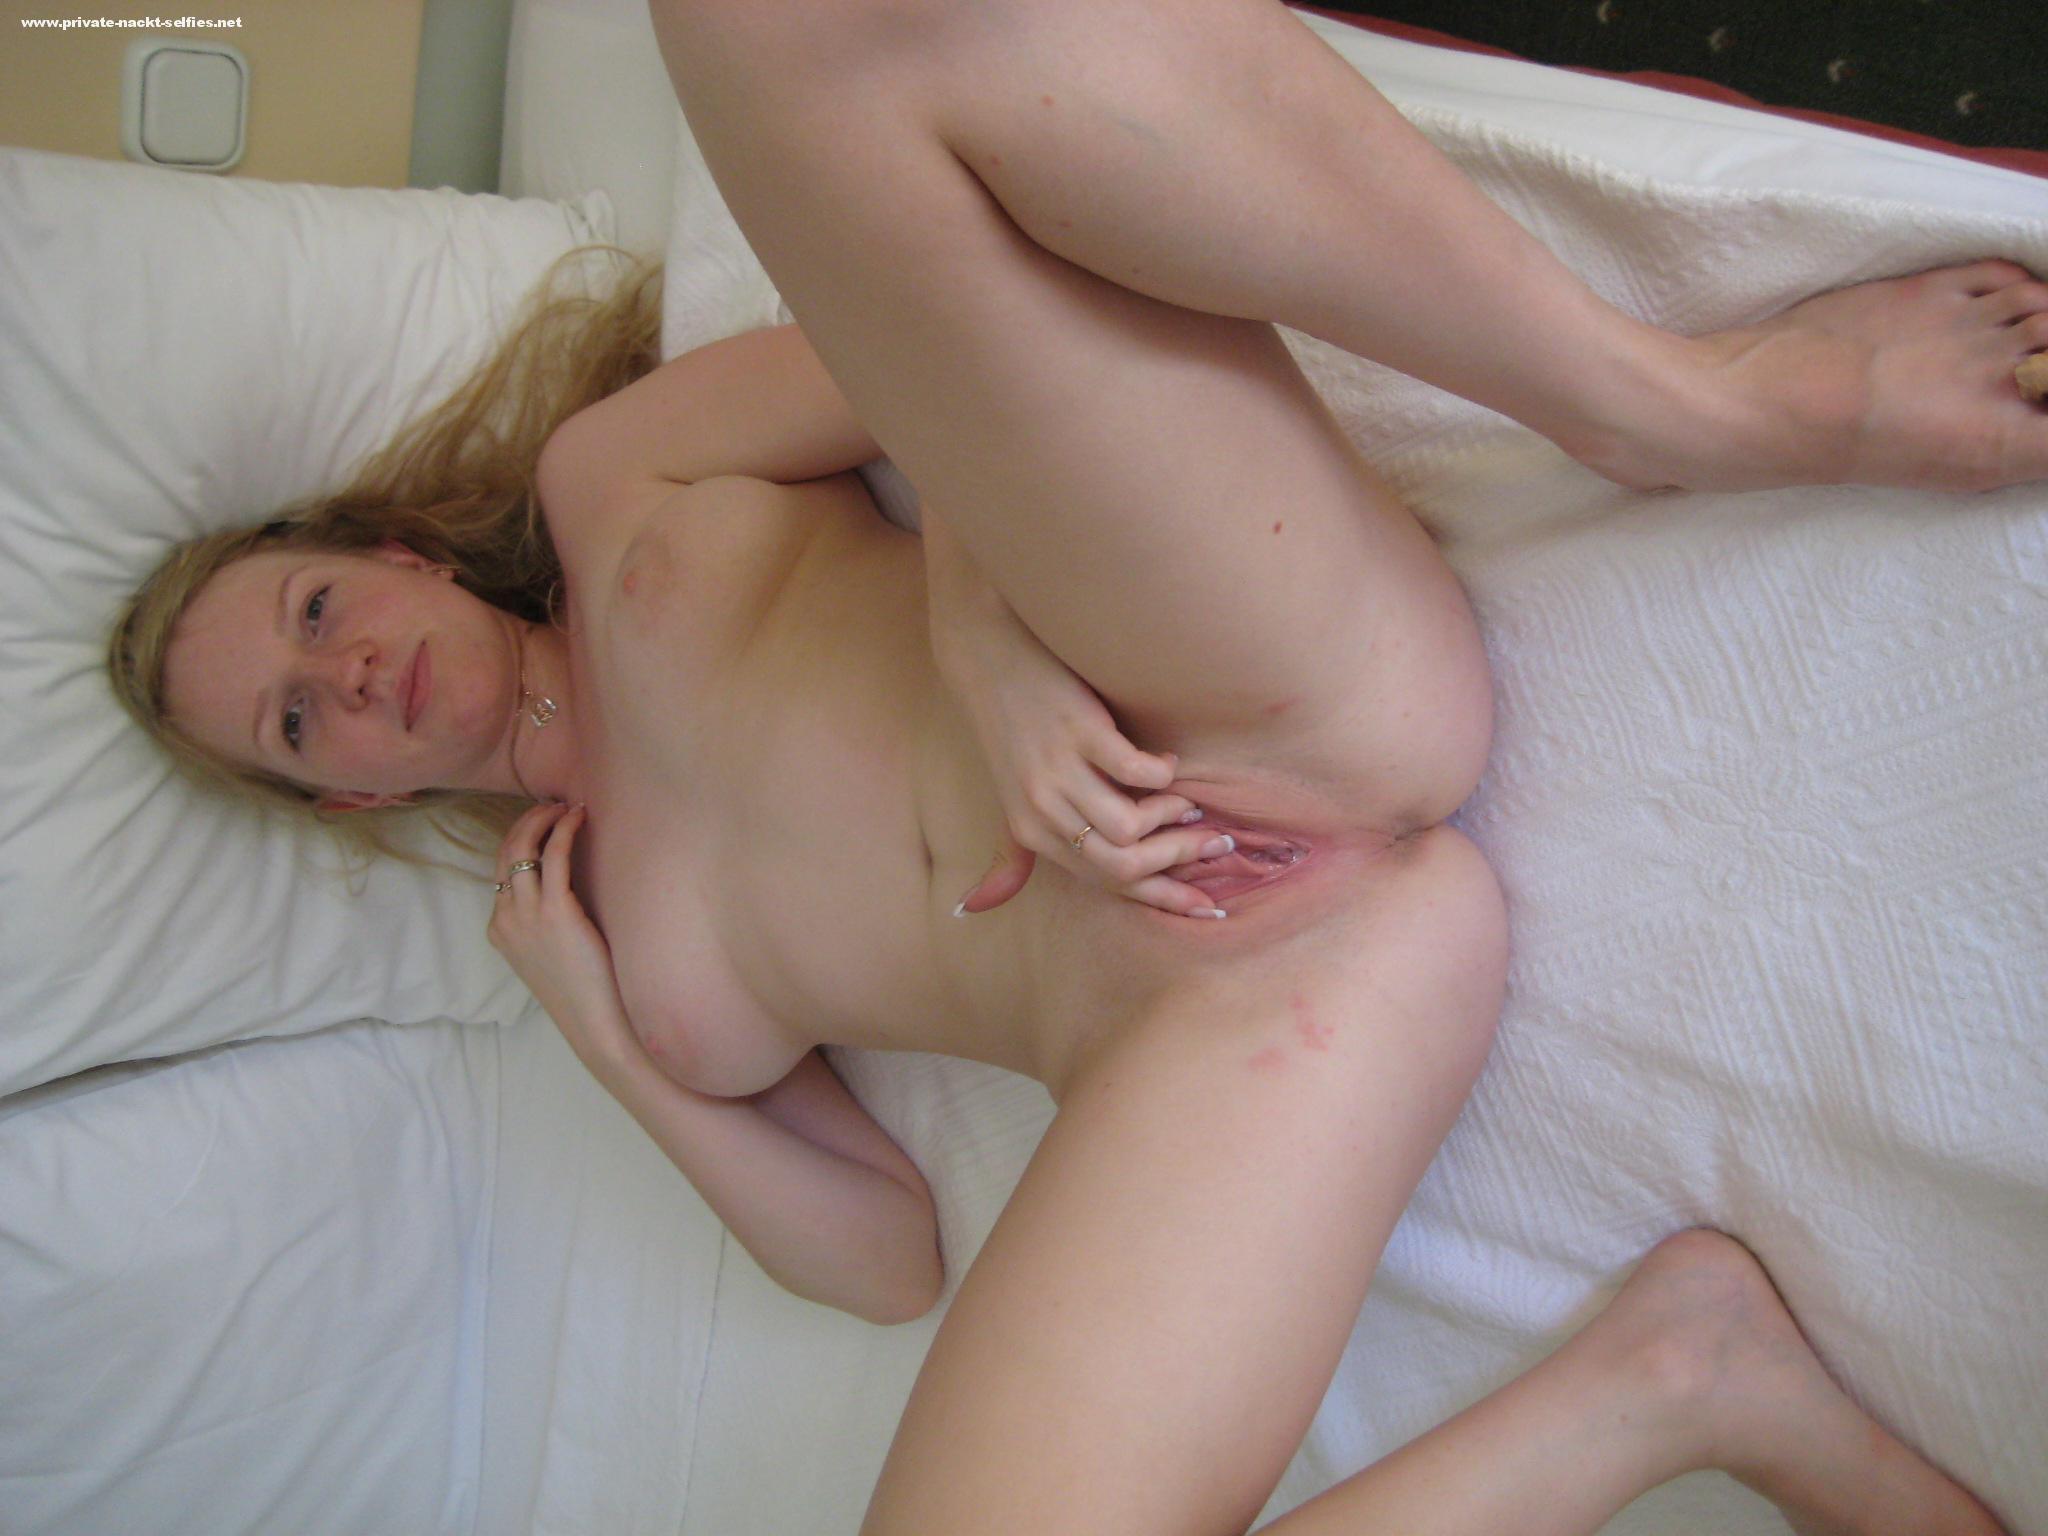 Nackt auf bett selfi